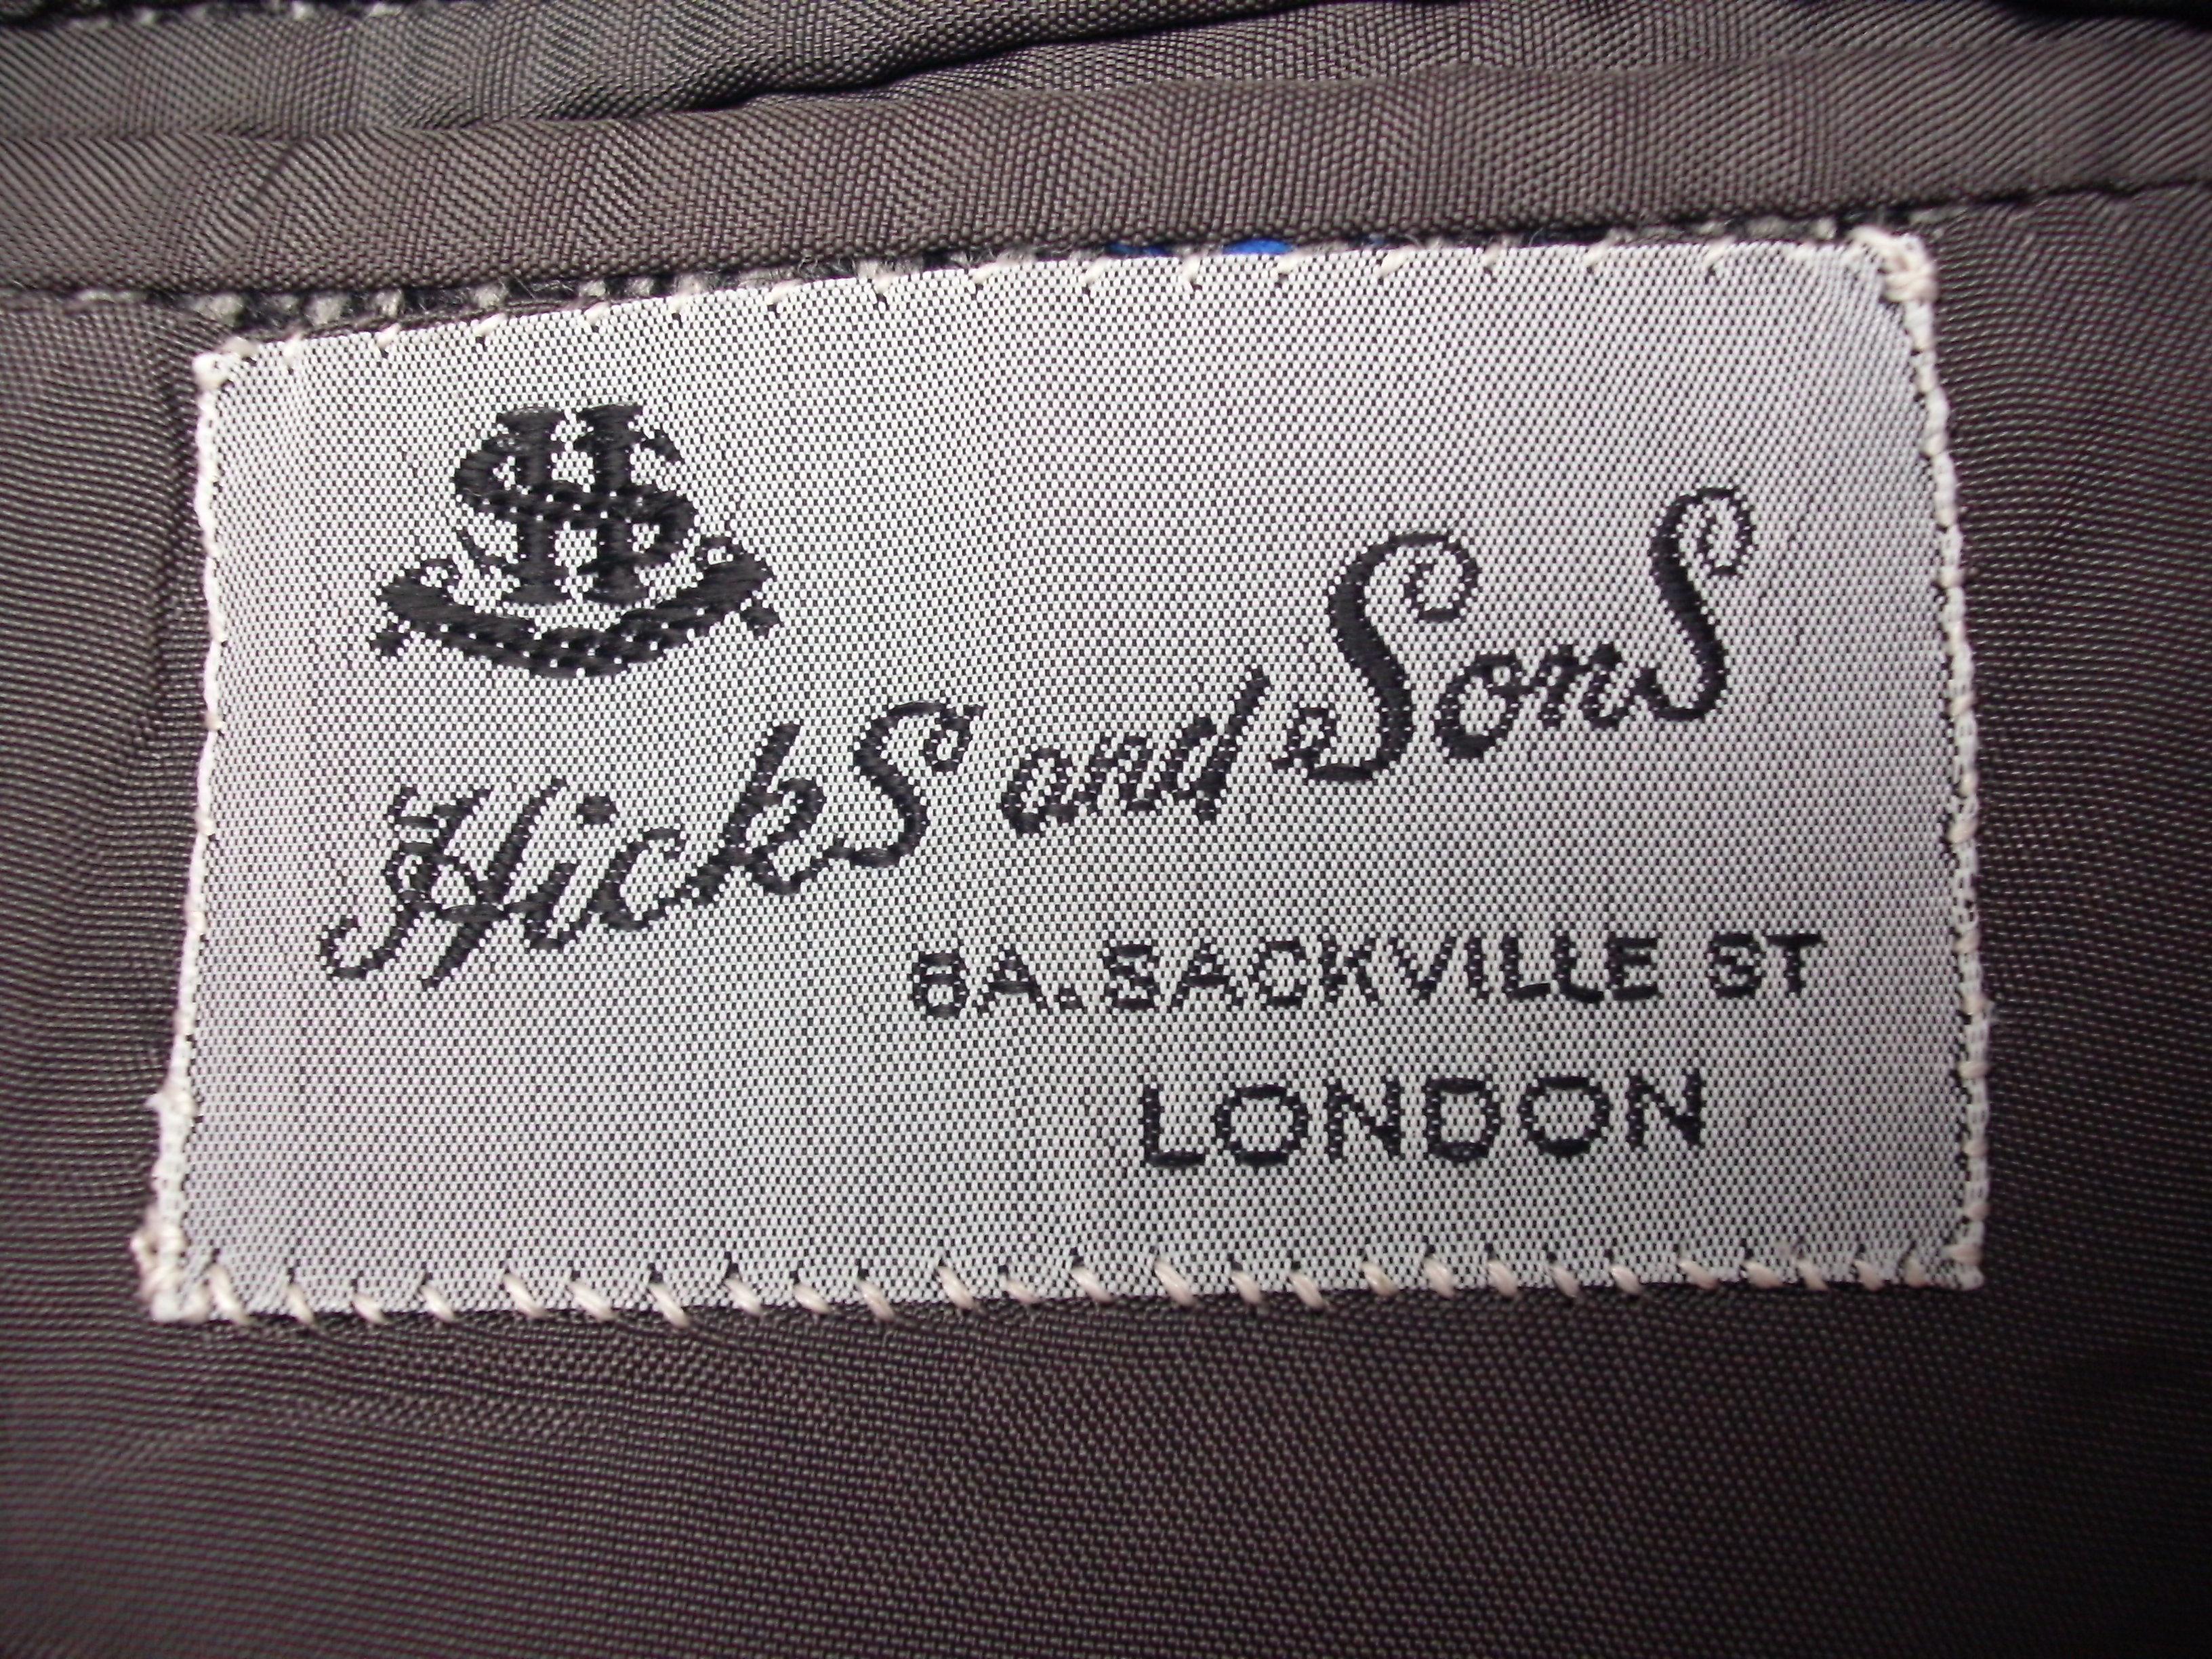 Hicks (10).JPG